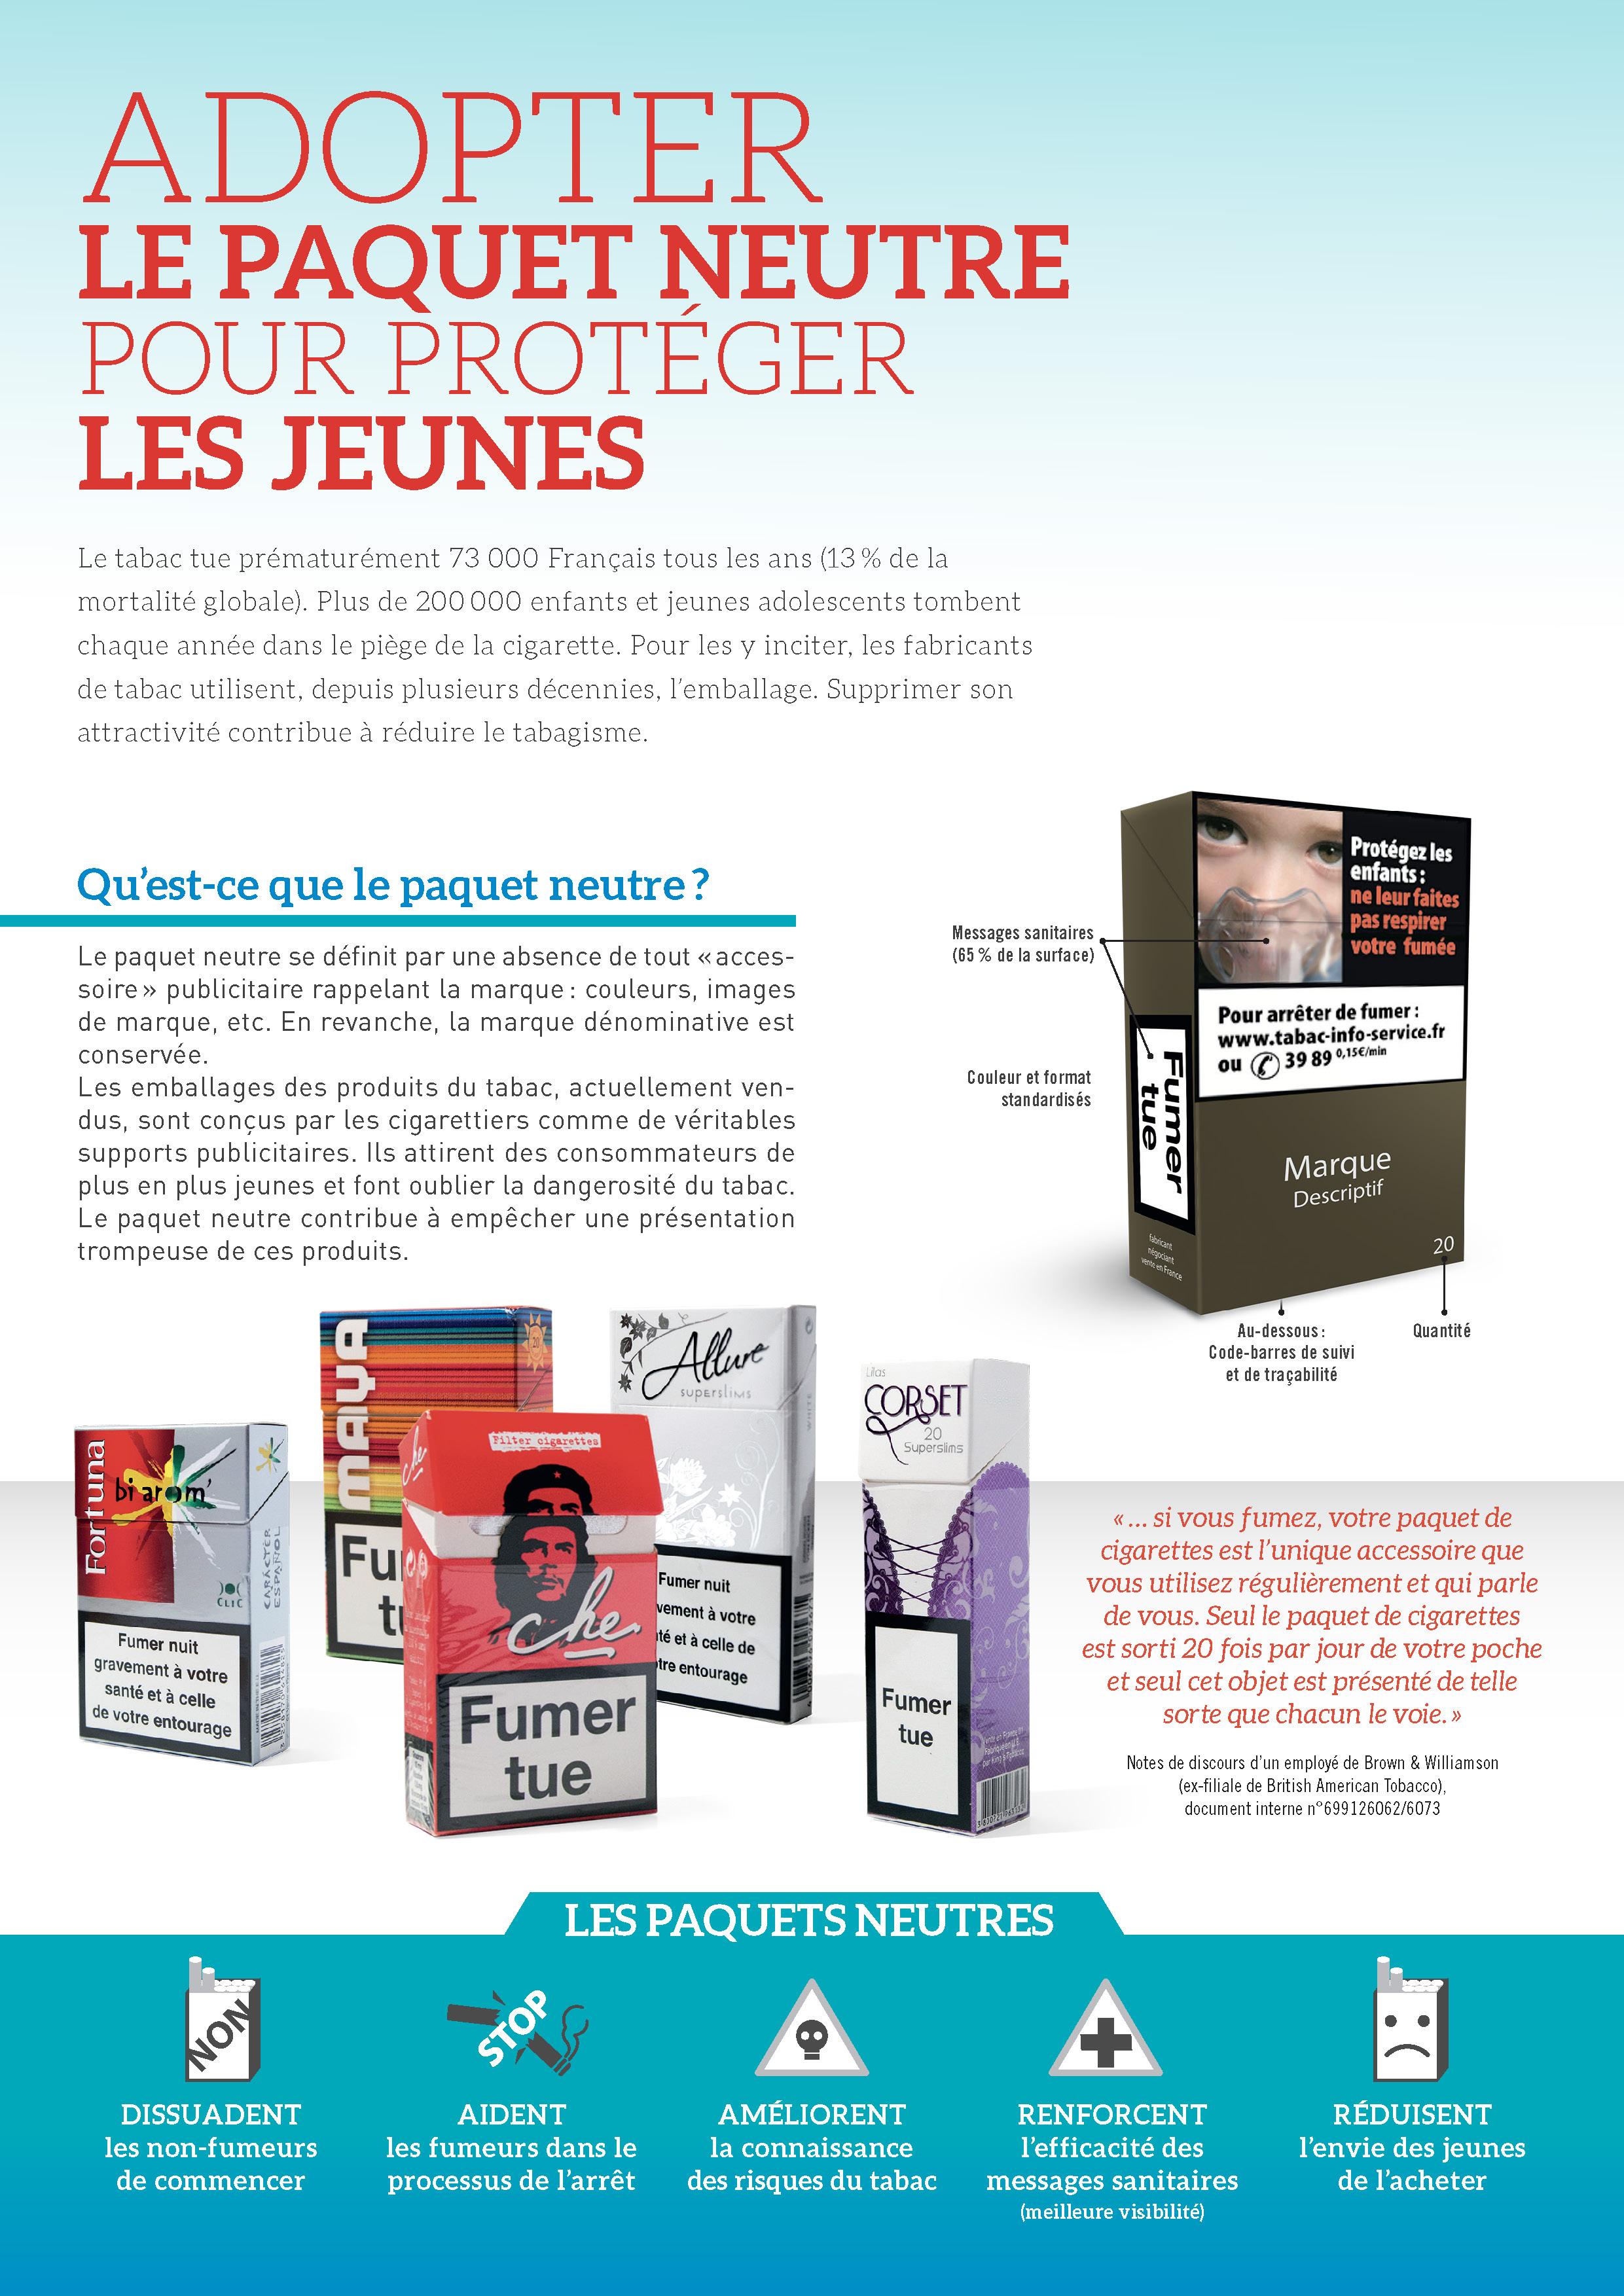 Alliance-DP_journee-mondiale-sans-tabac-avec-annexes-vf-30mai2016_Page_09.jpg